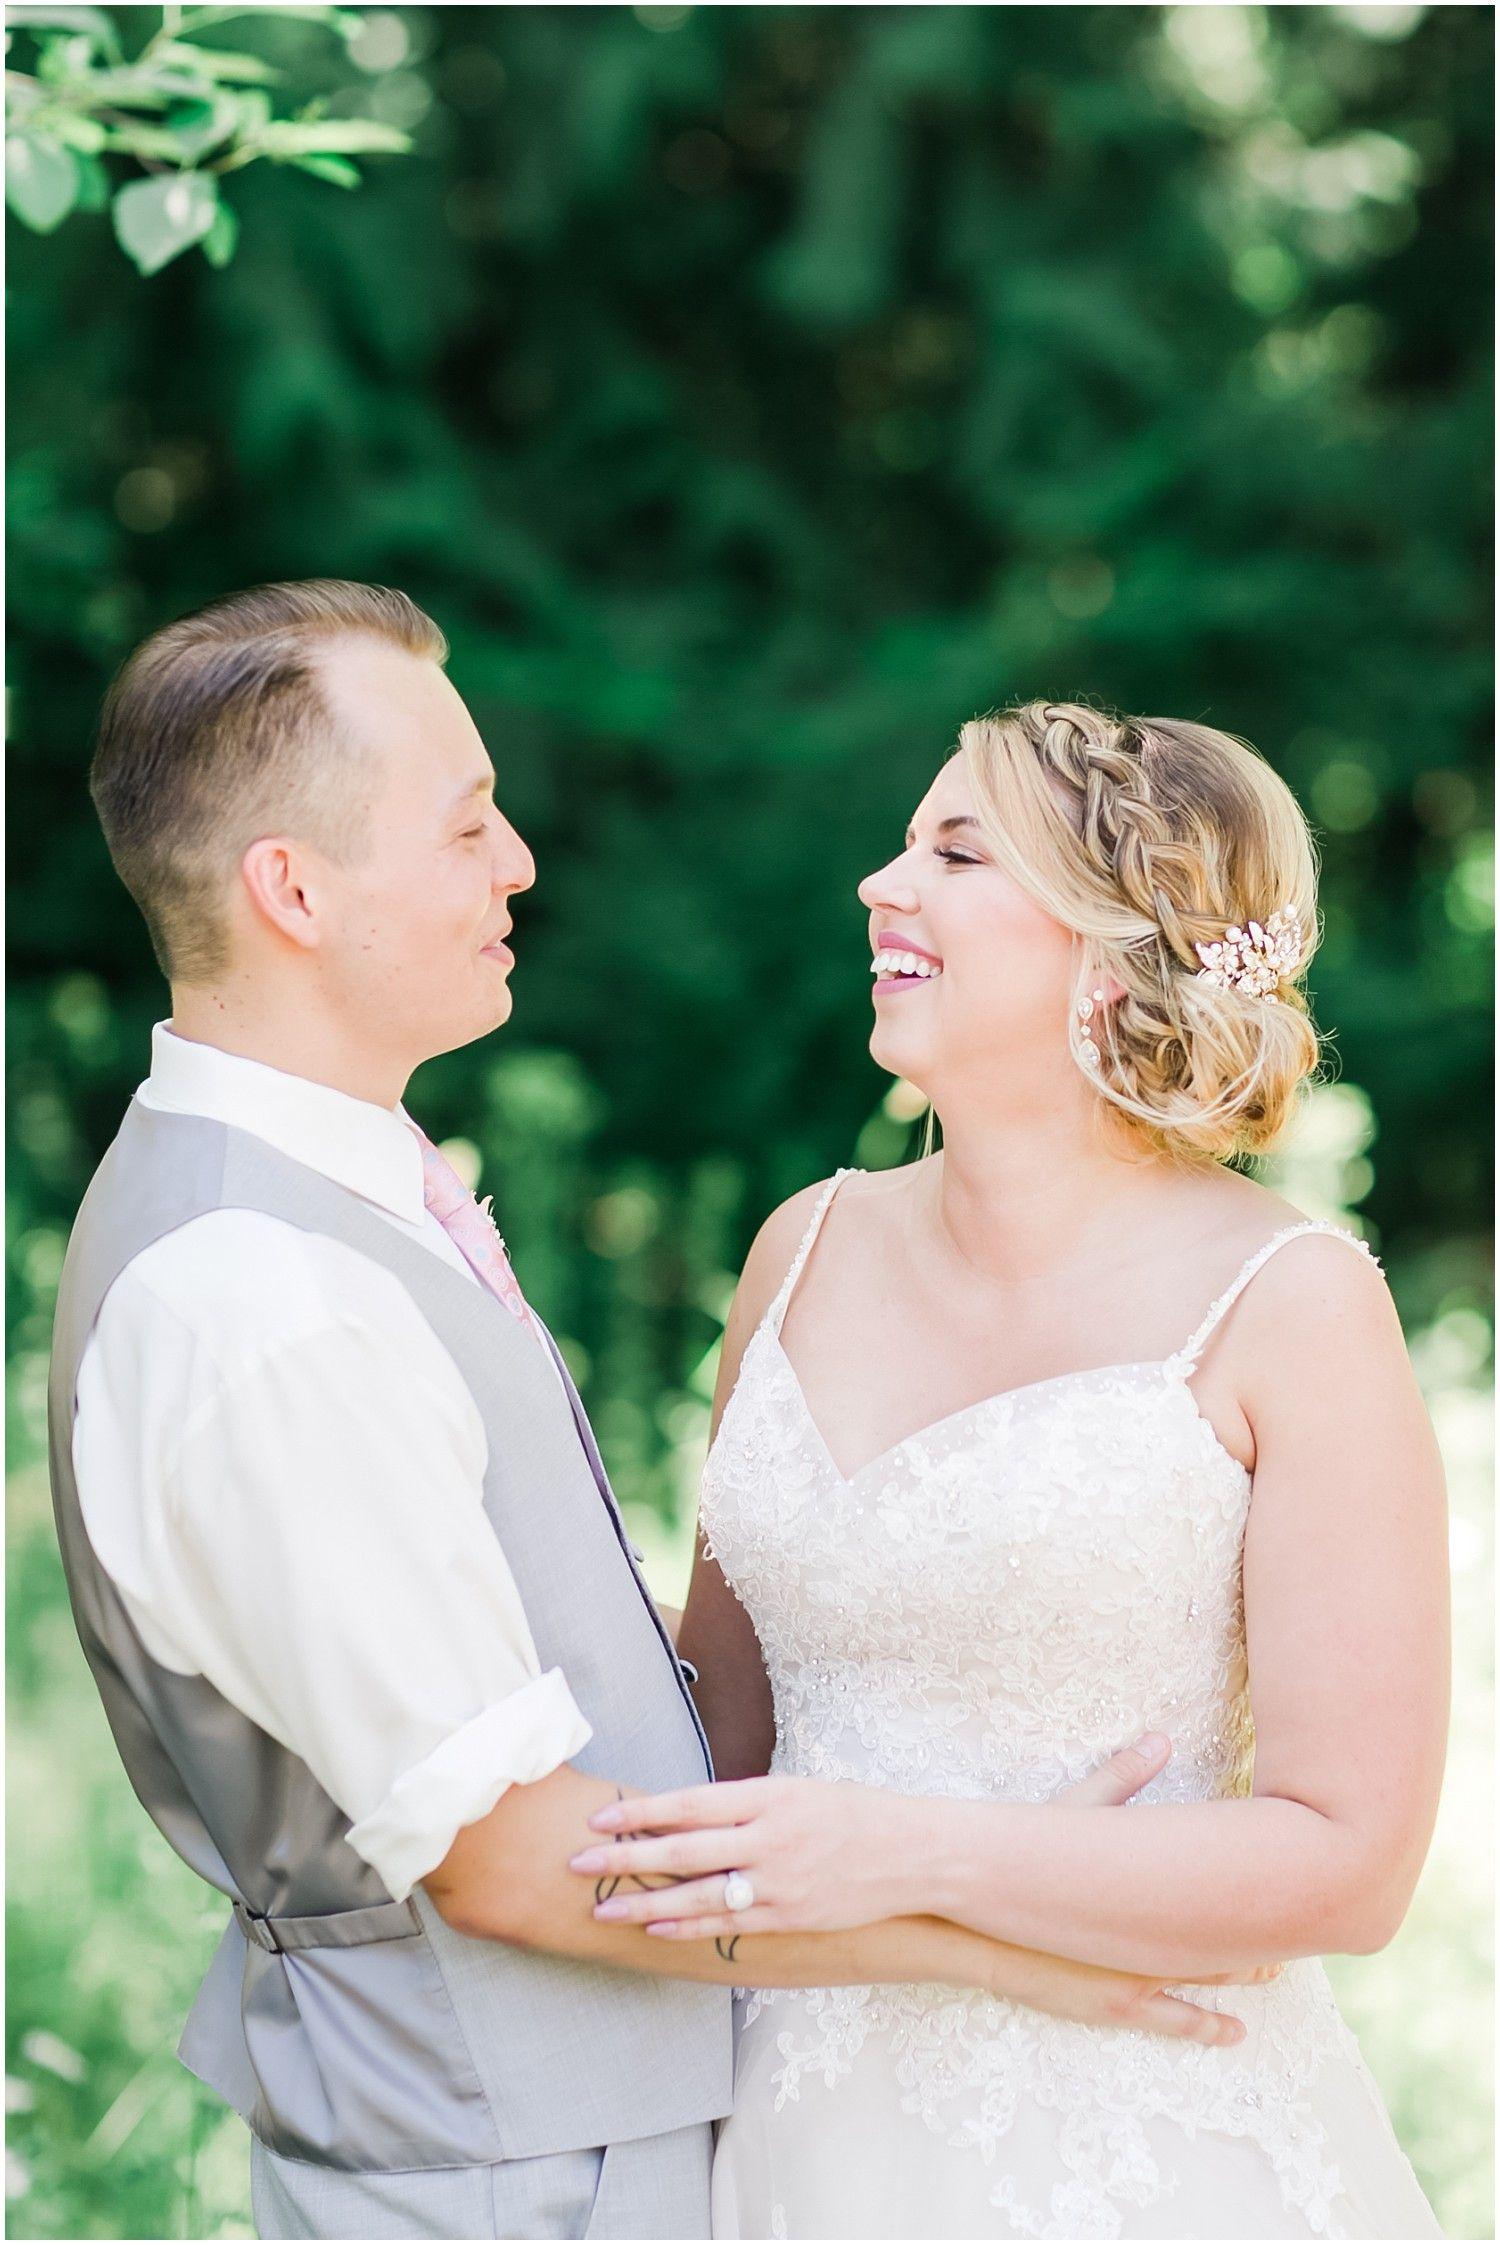 quinton & nicole's rustic blush wedding at trinity tree farm in